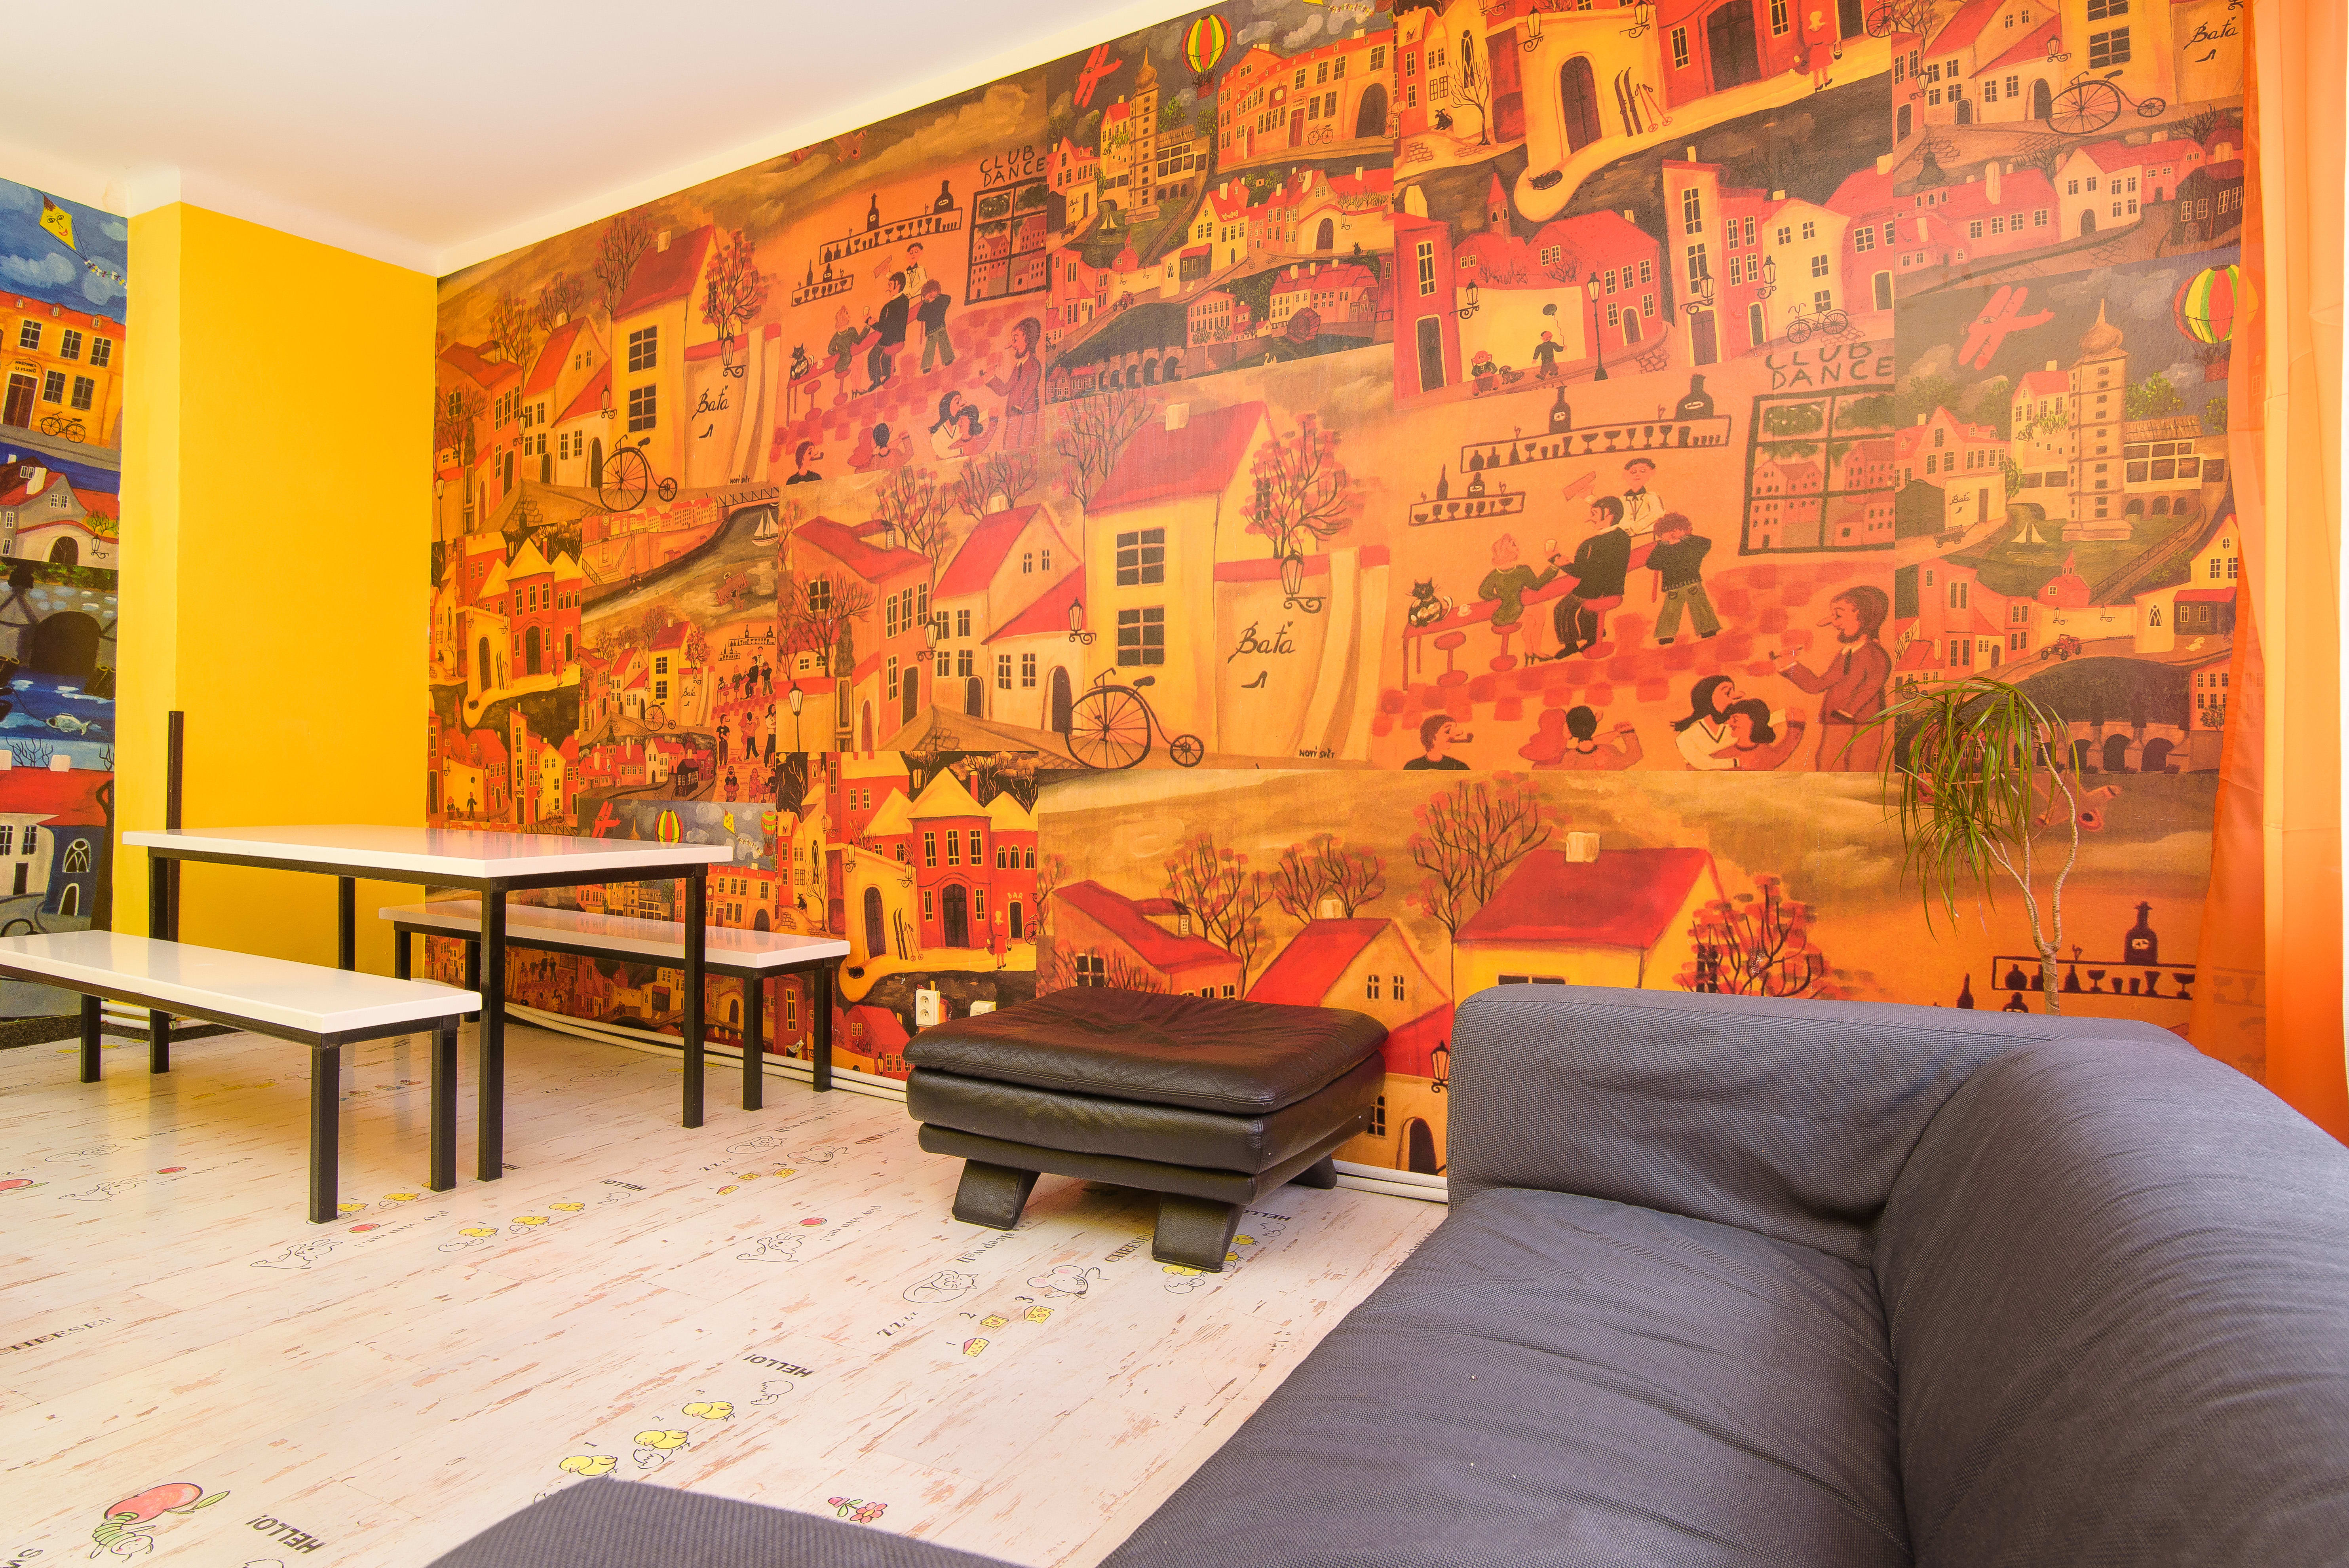 HOSTEL - Old Prague Hostel